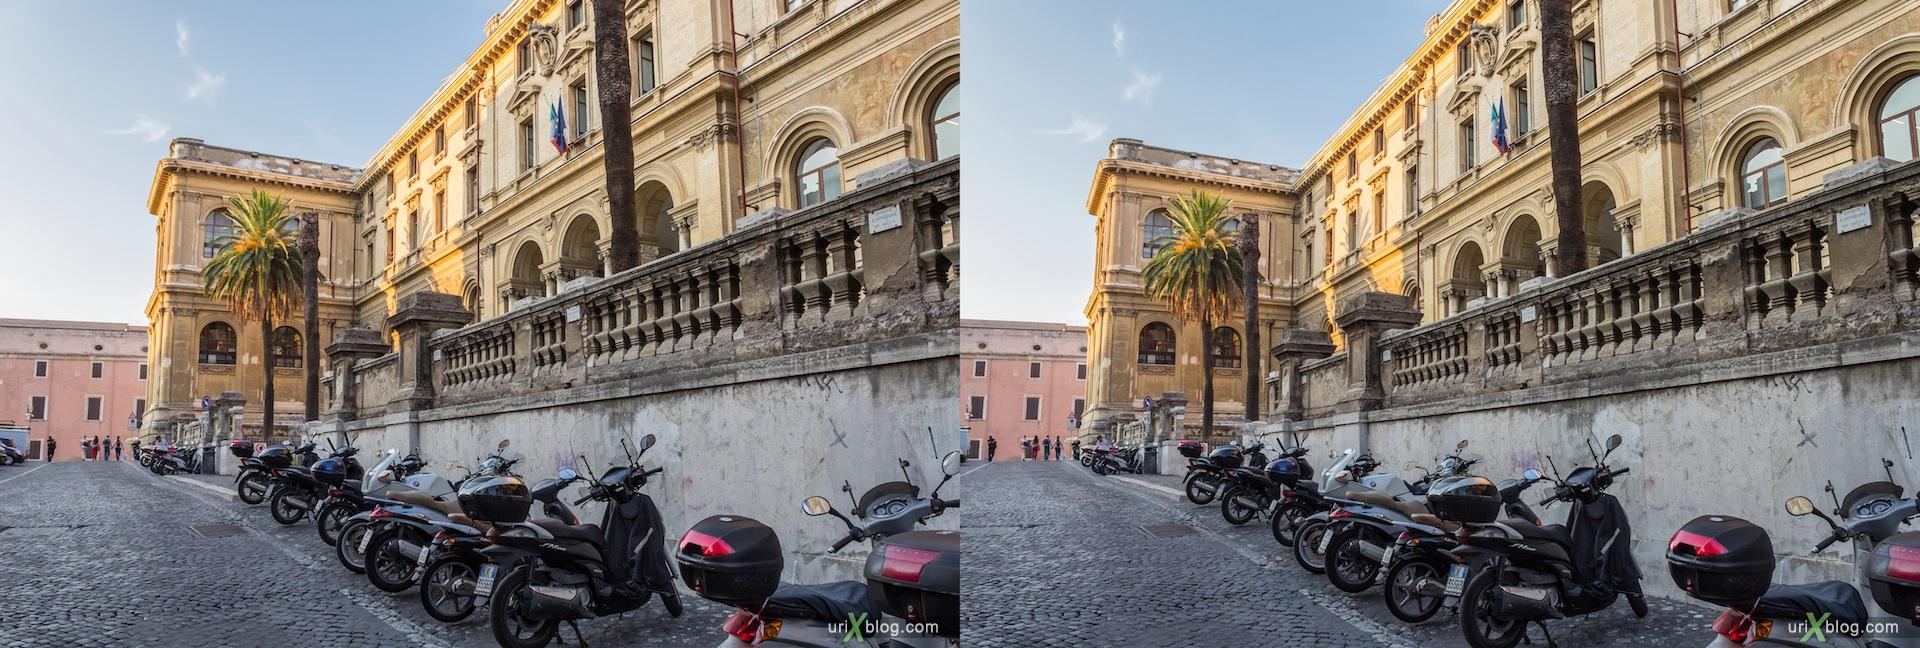 2012, via Eudossiana street, Faculty of Engineering, la Sapienza University, 3D, stereo pair, cross-eyed, crossview, cross view stereo pair